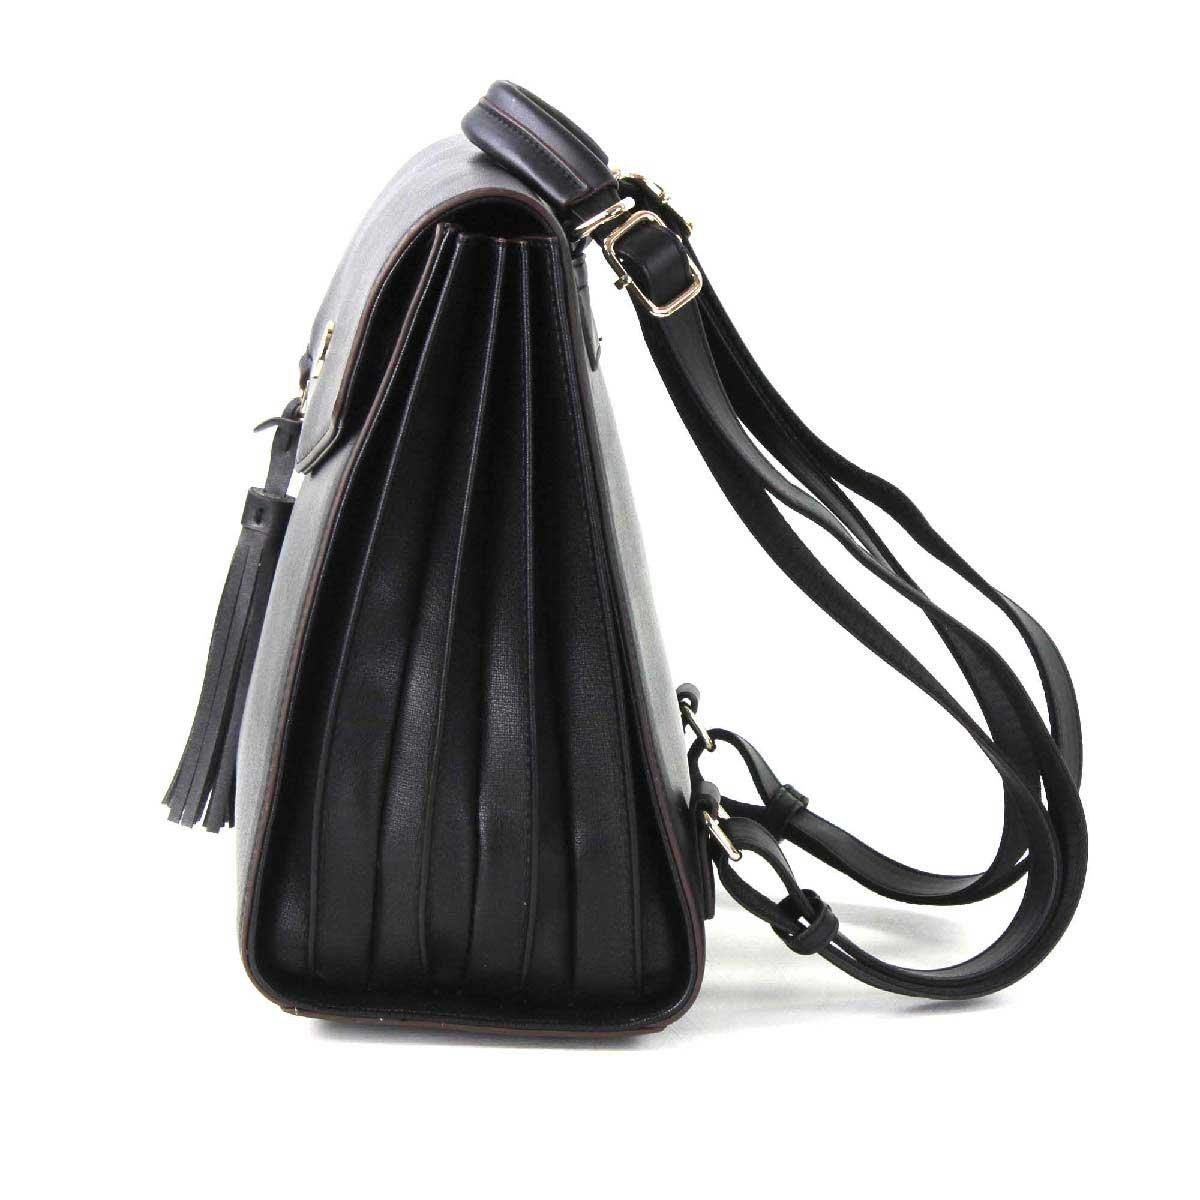 COM entiende SEARS Me Negra Backpack Cloe Bolsa Estilo MX xZOXq1